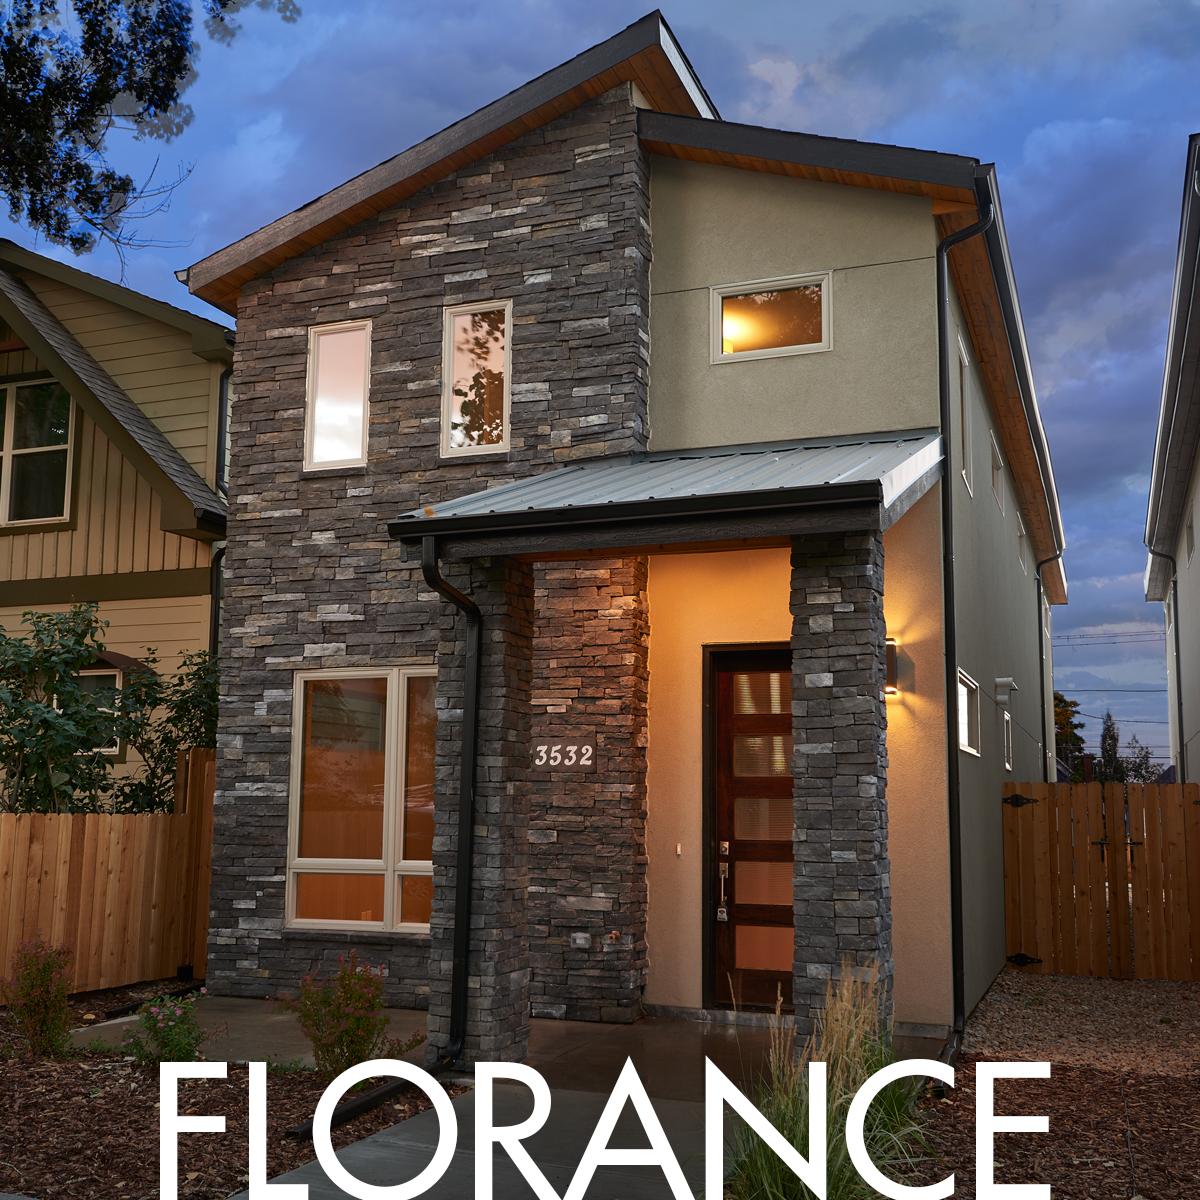 Florance_Sq.png